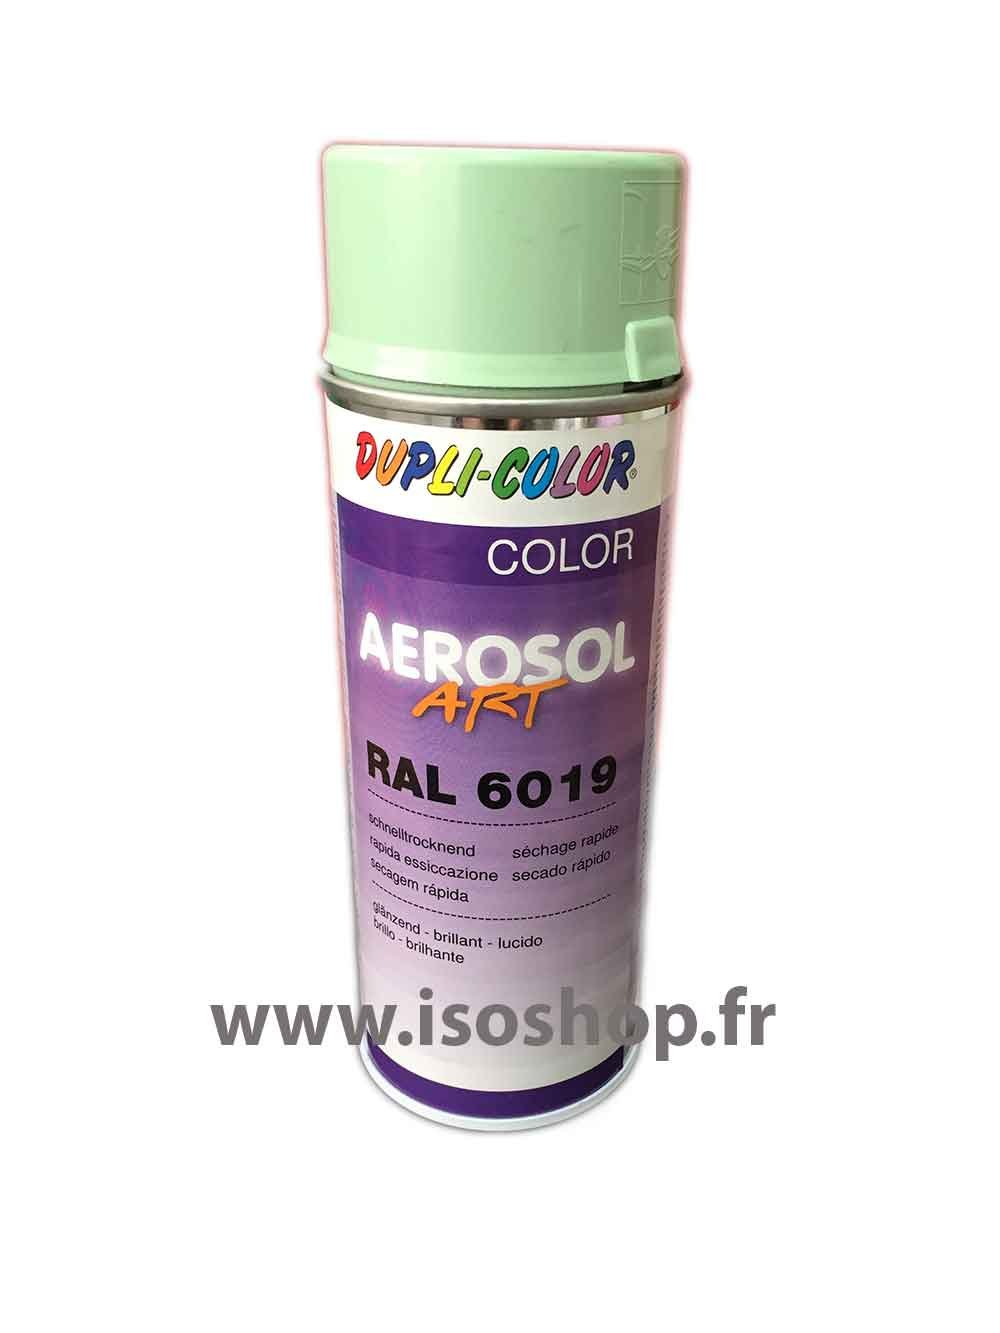 Vernice in bomboletta, colore: verde muschio (RAL 6019, 400 ml, colore: bianco Isoterm France